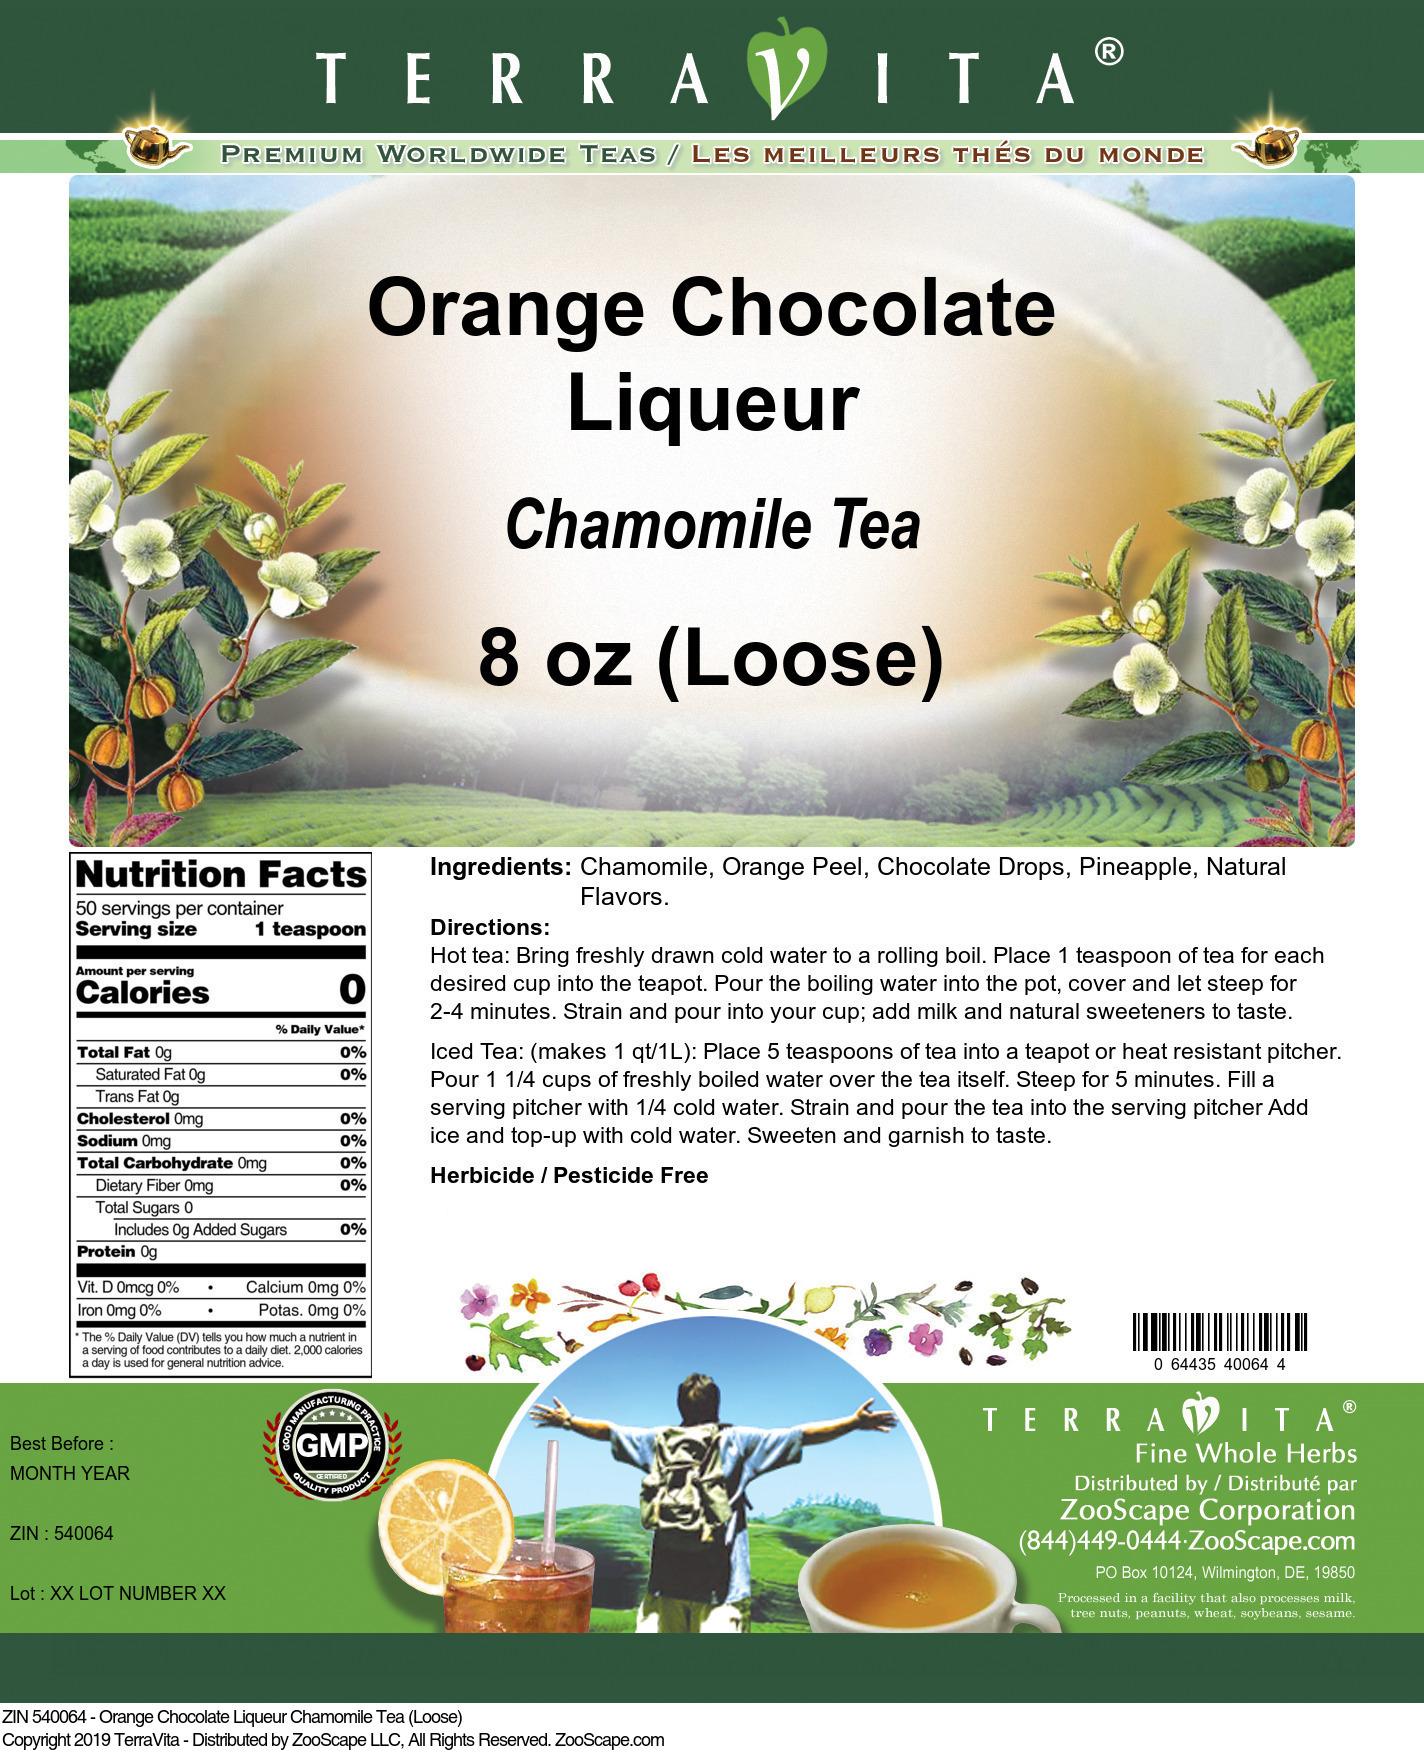 Orange Chocolate Liqueur Chamomile Tea (Loose)